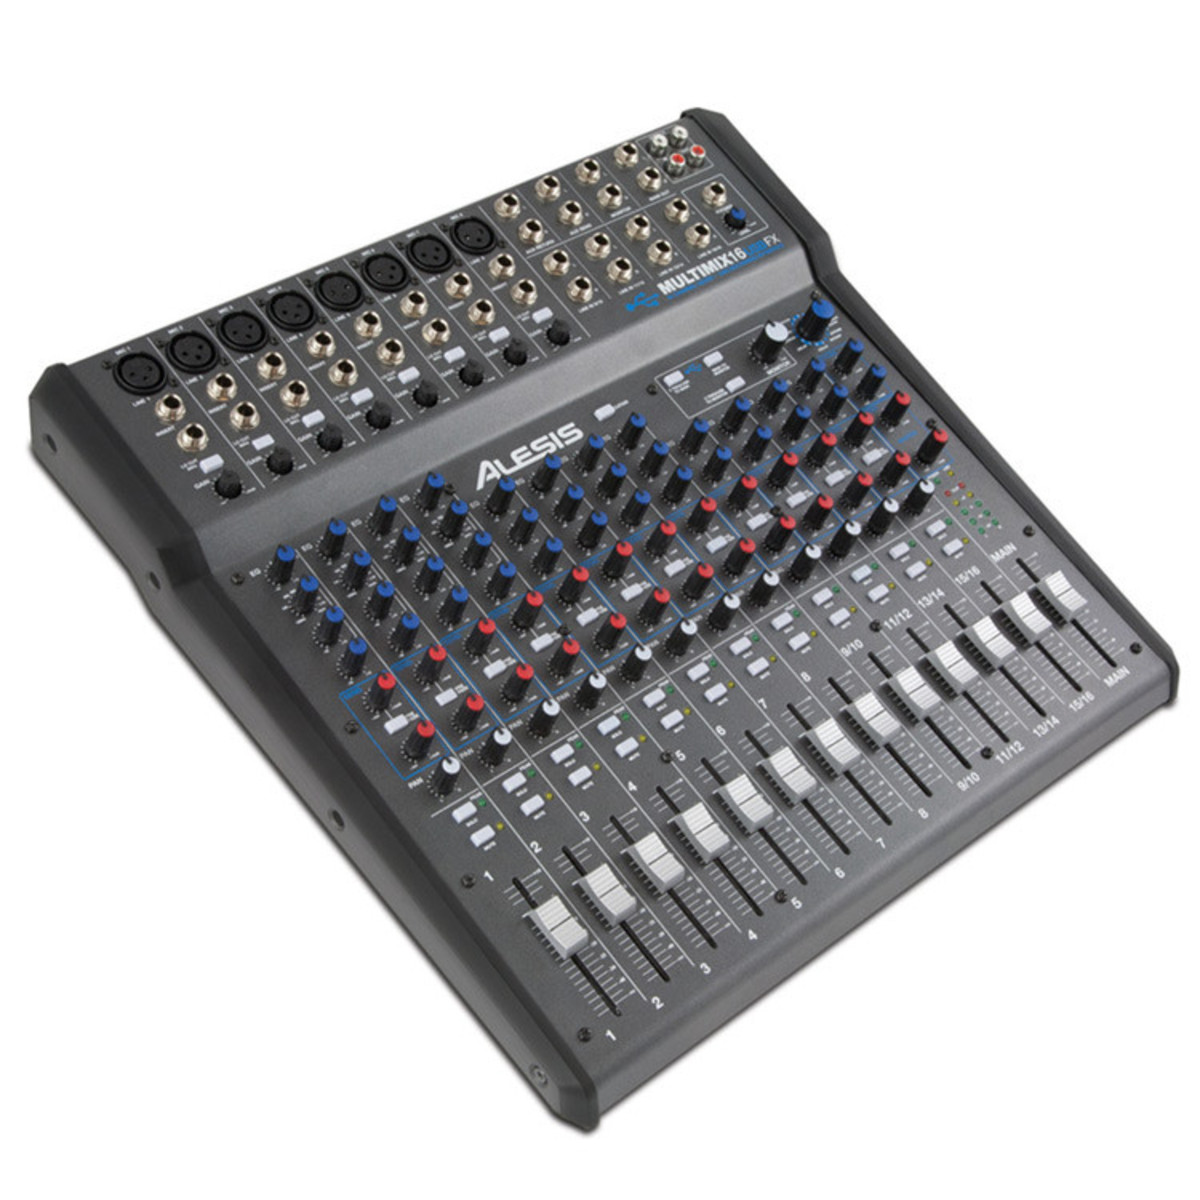 puis usb alesis multimix 16 fx table de mixage. Black Bedroom Furniture Sets. Home Design Ideas